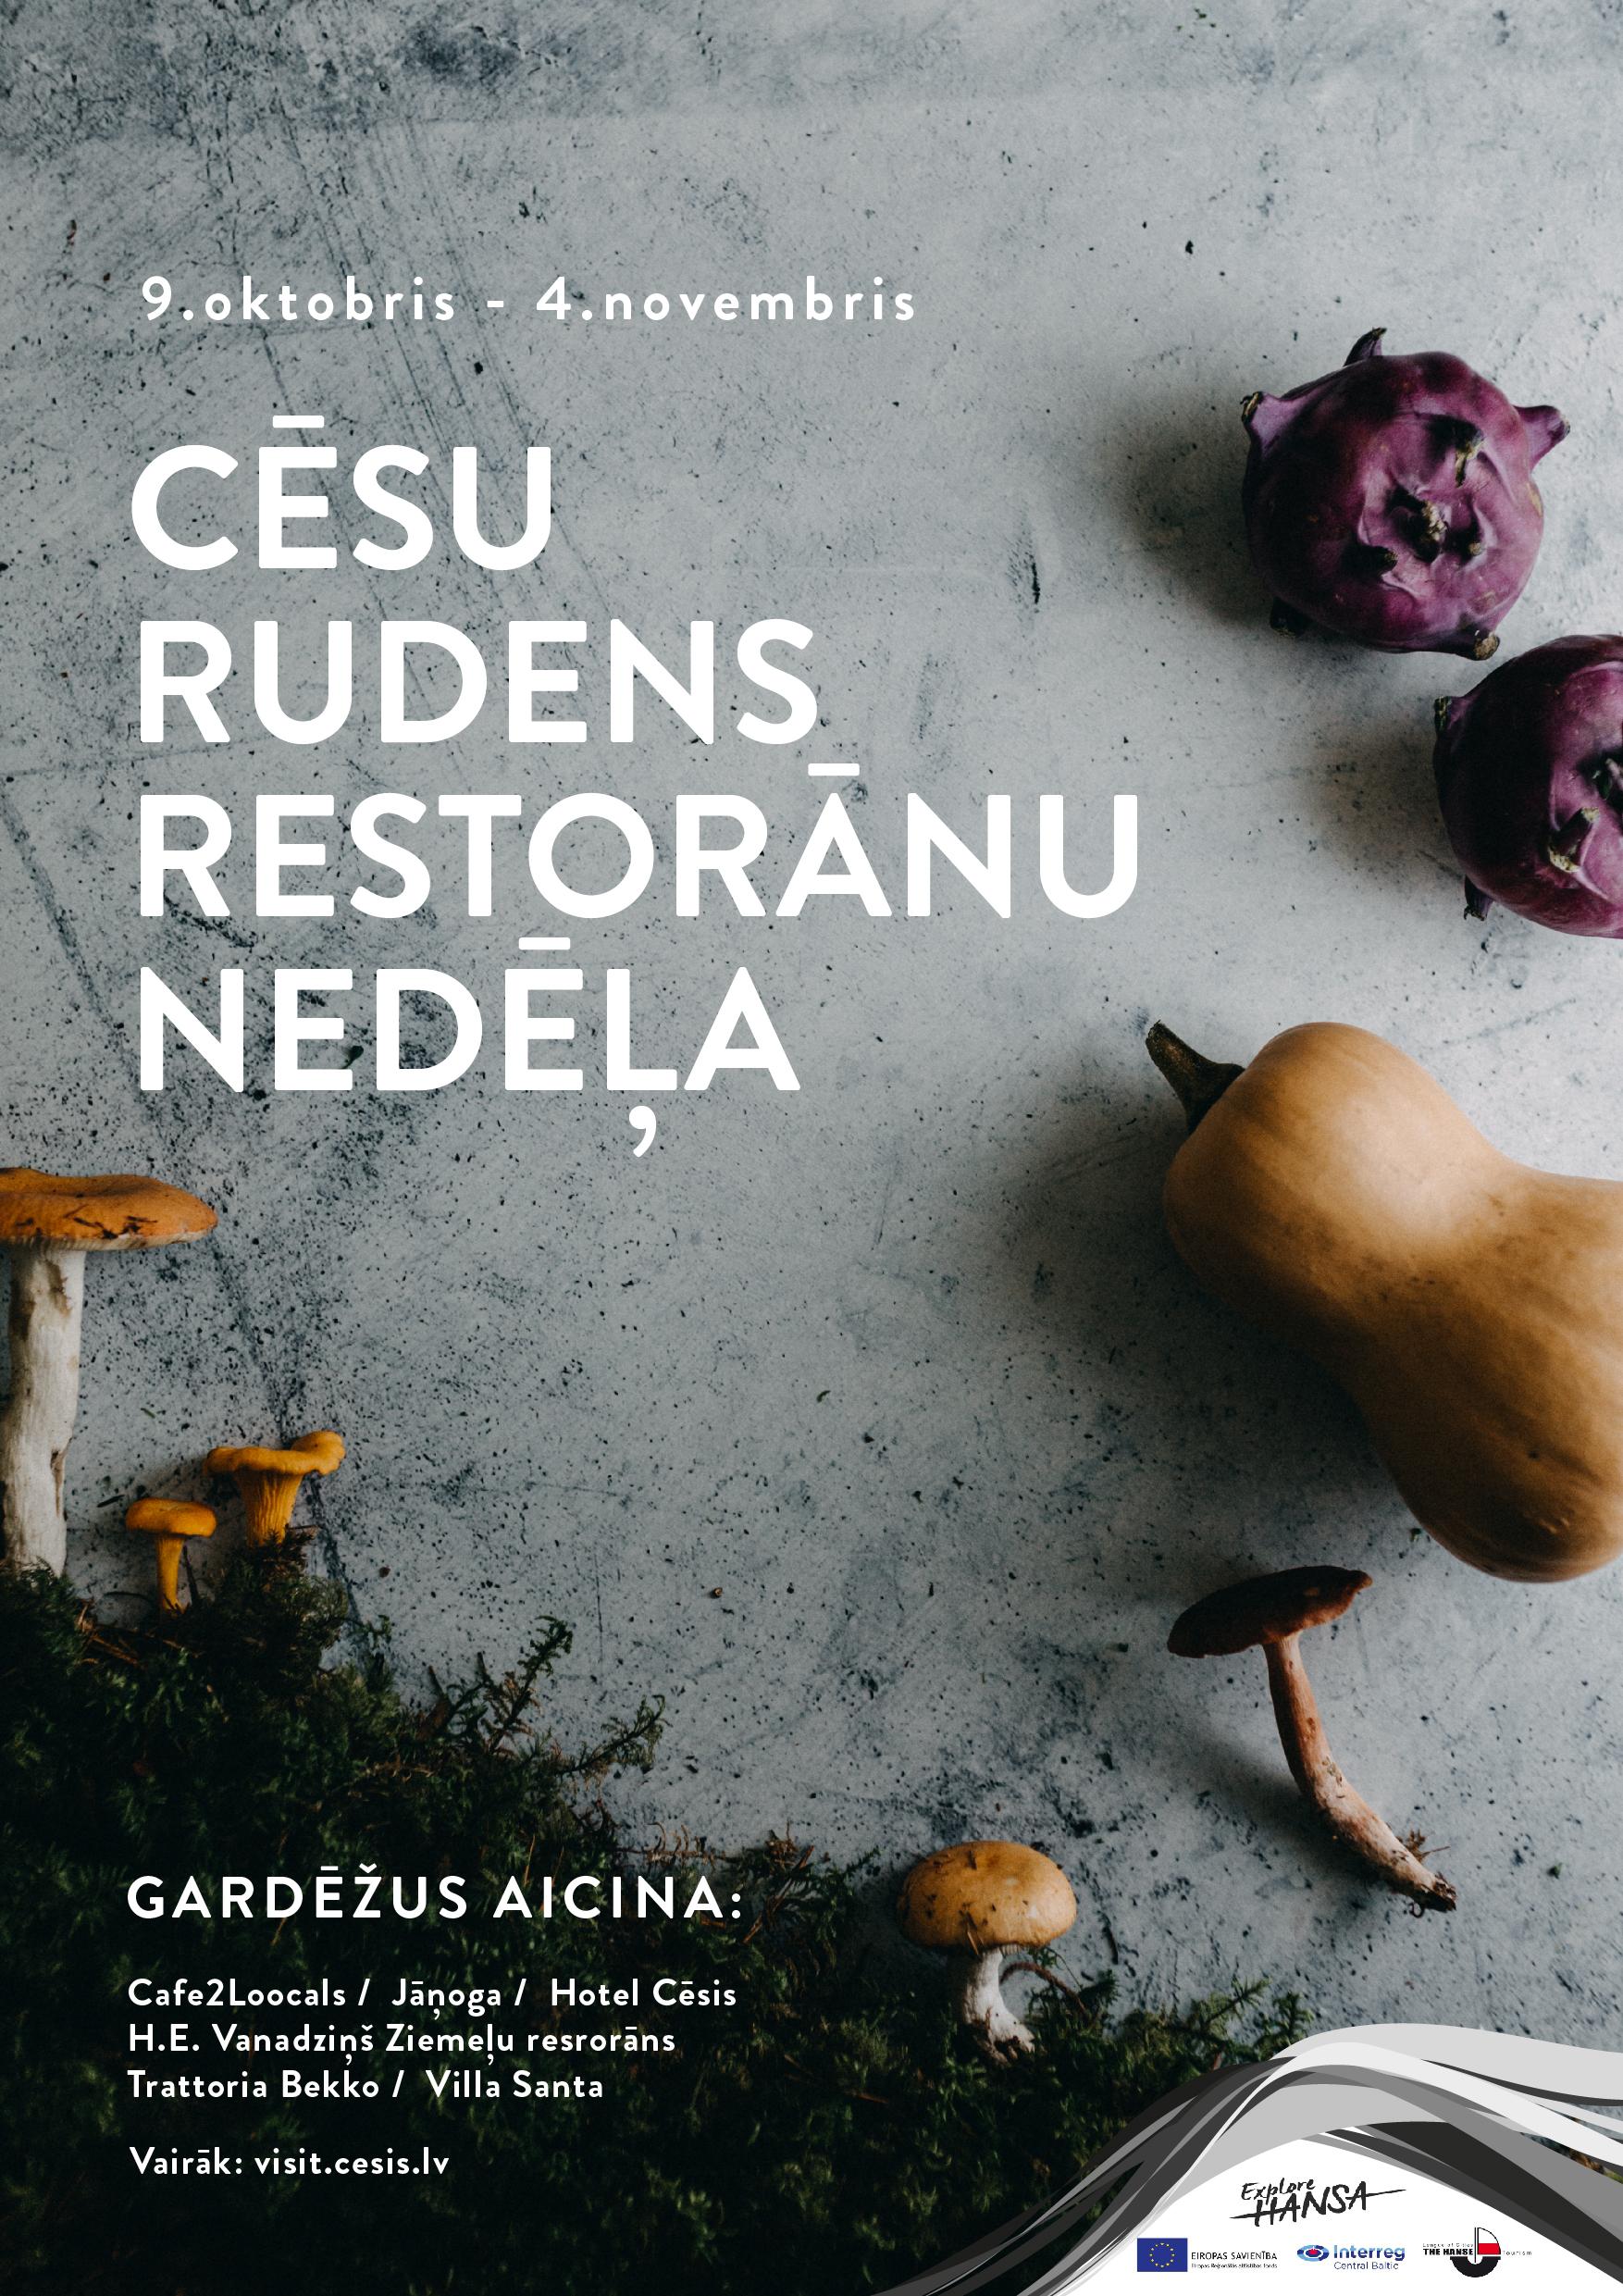 a3_plakats_restoranu ned_test_v3-01